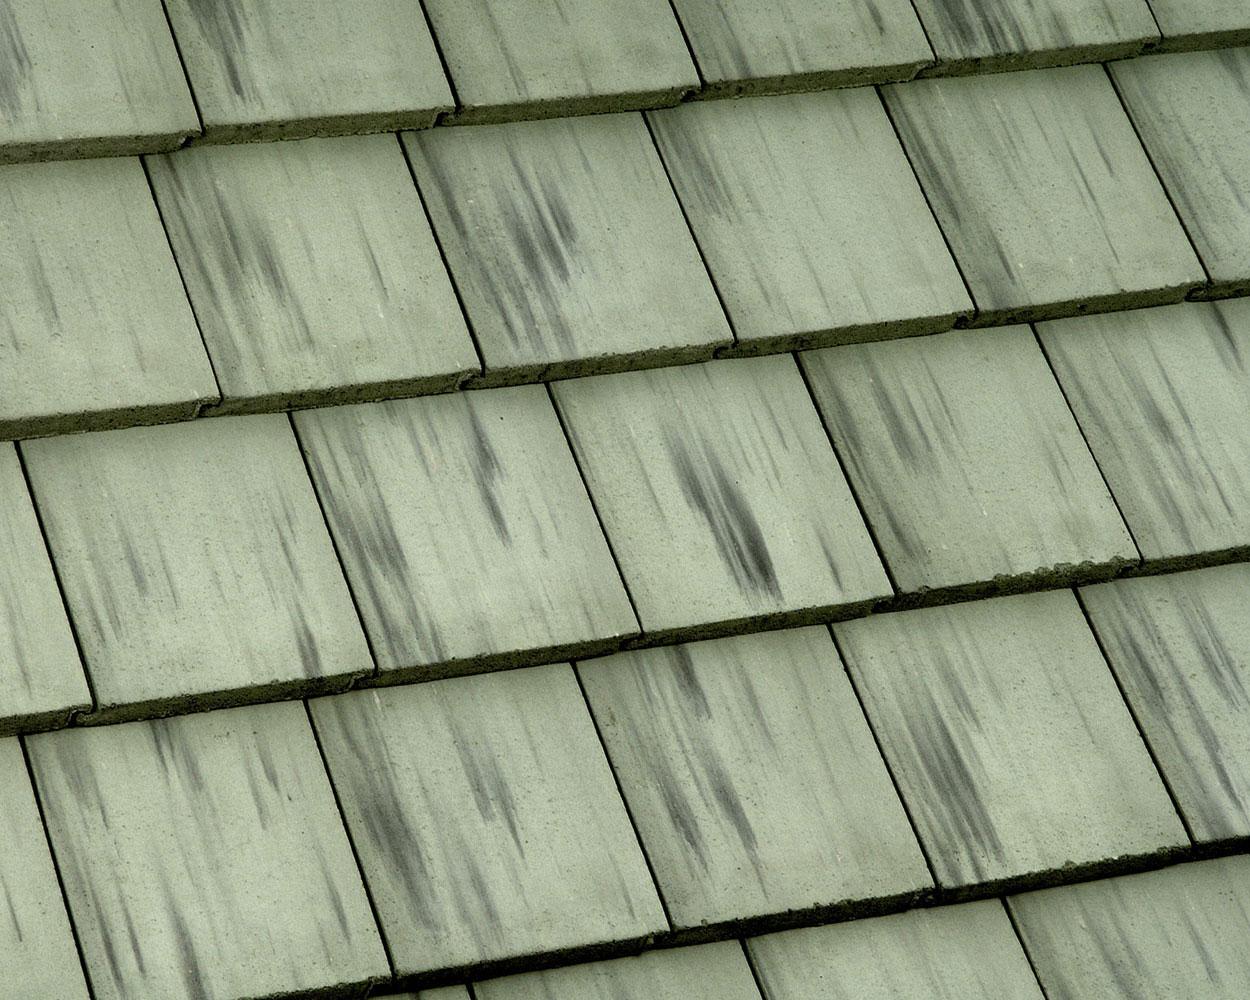 Moss creek tile roof color swatch